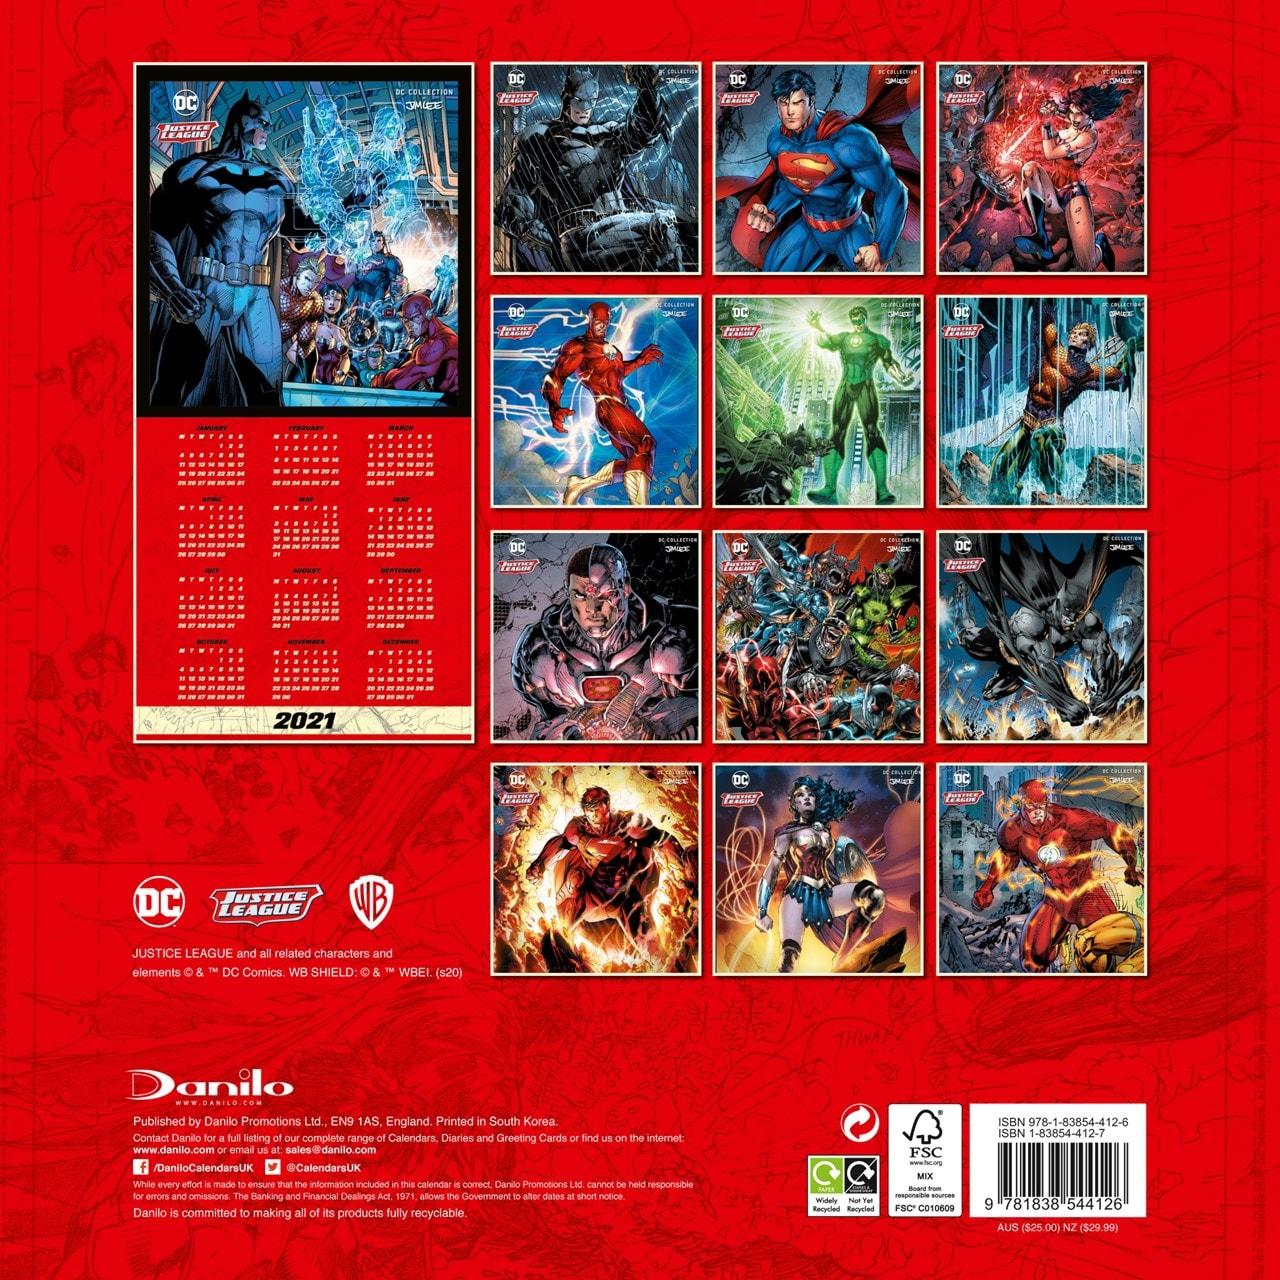 DC Comics Official Square 2021 Calendar - 3